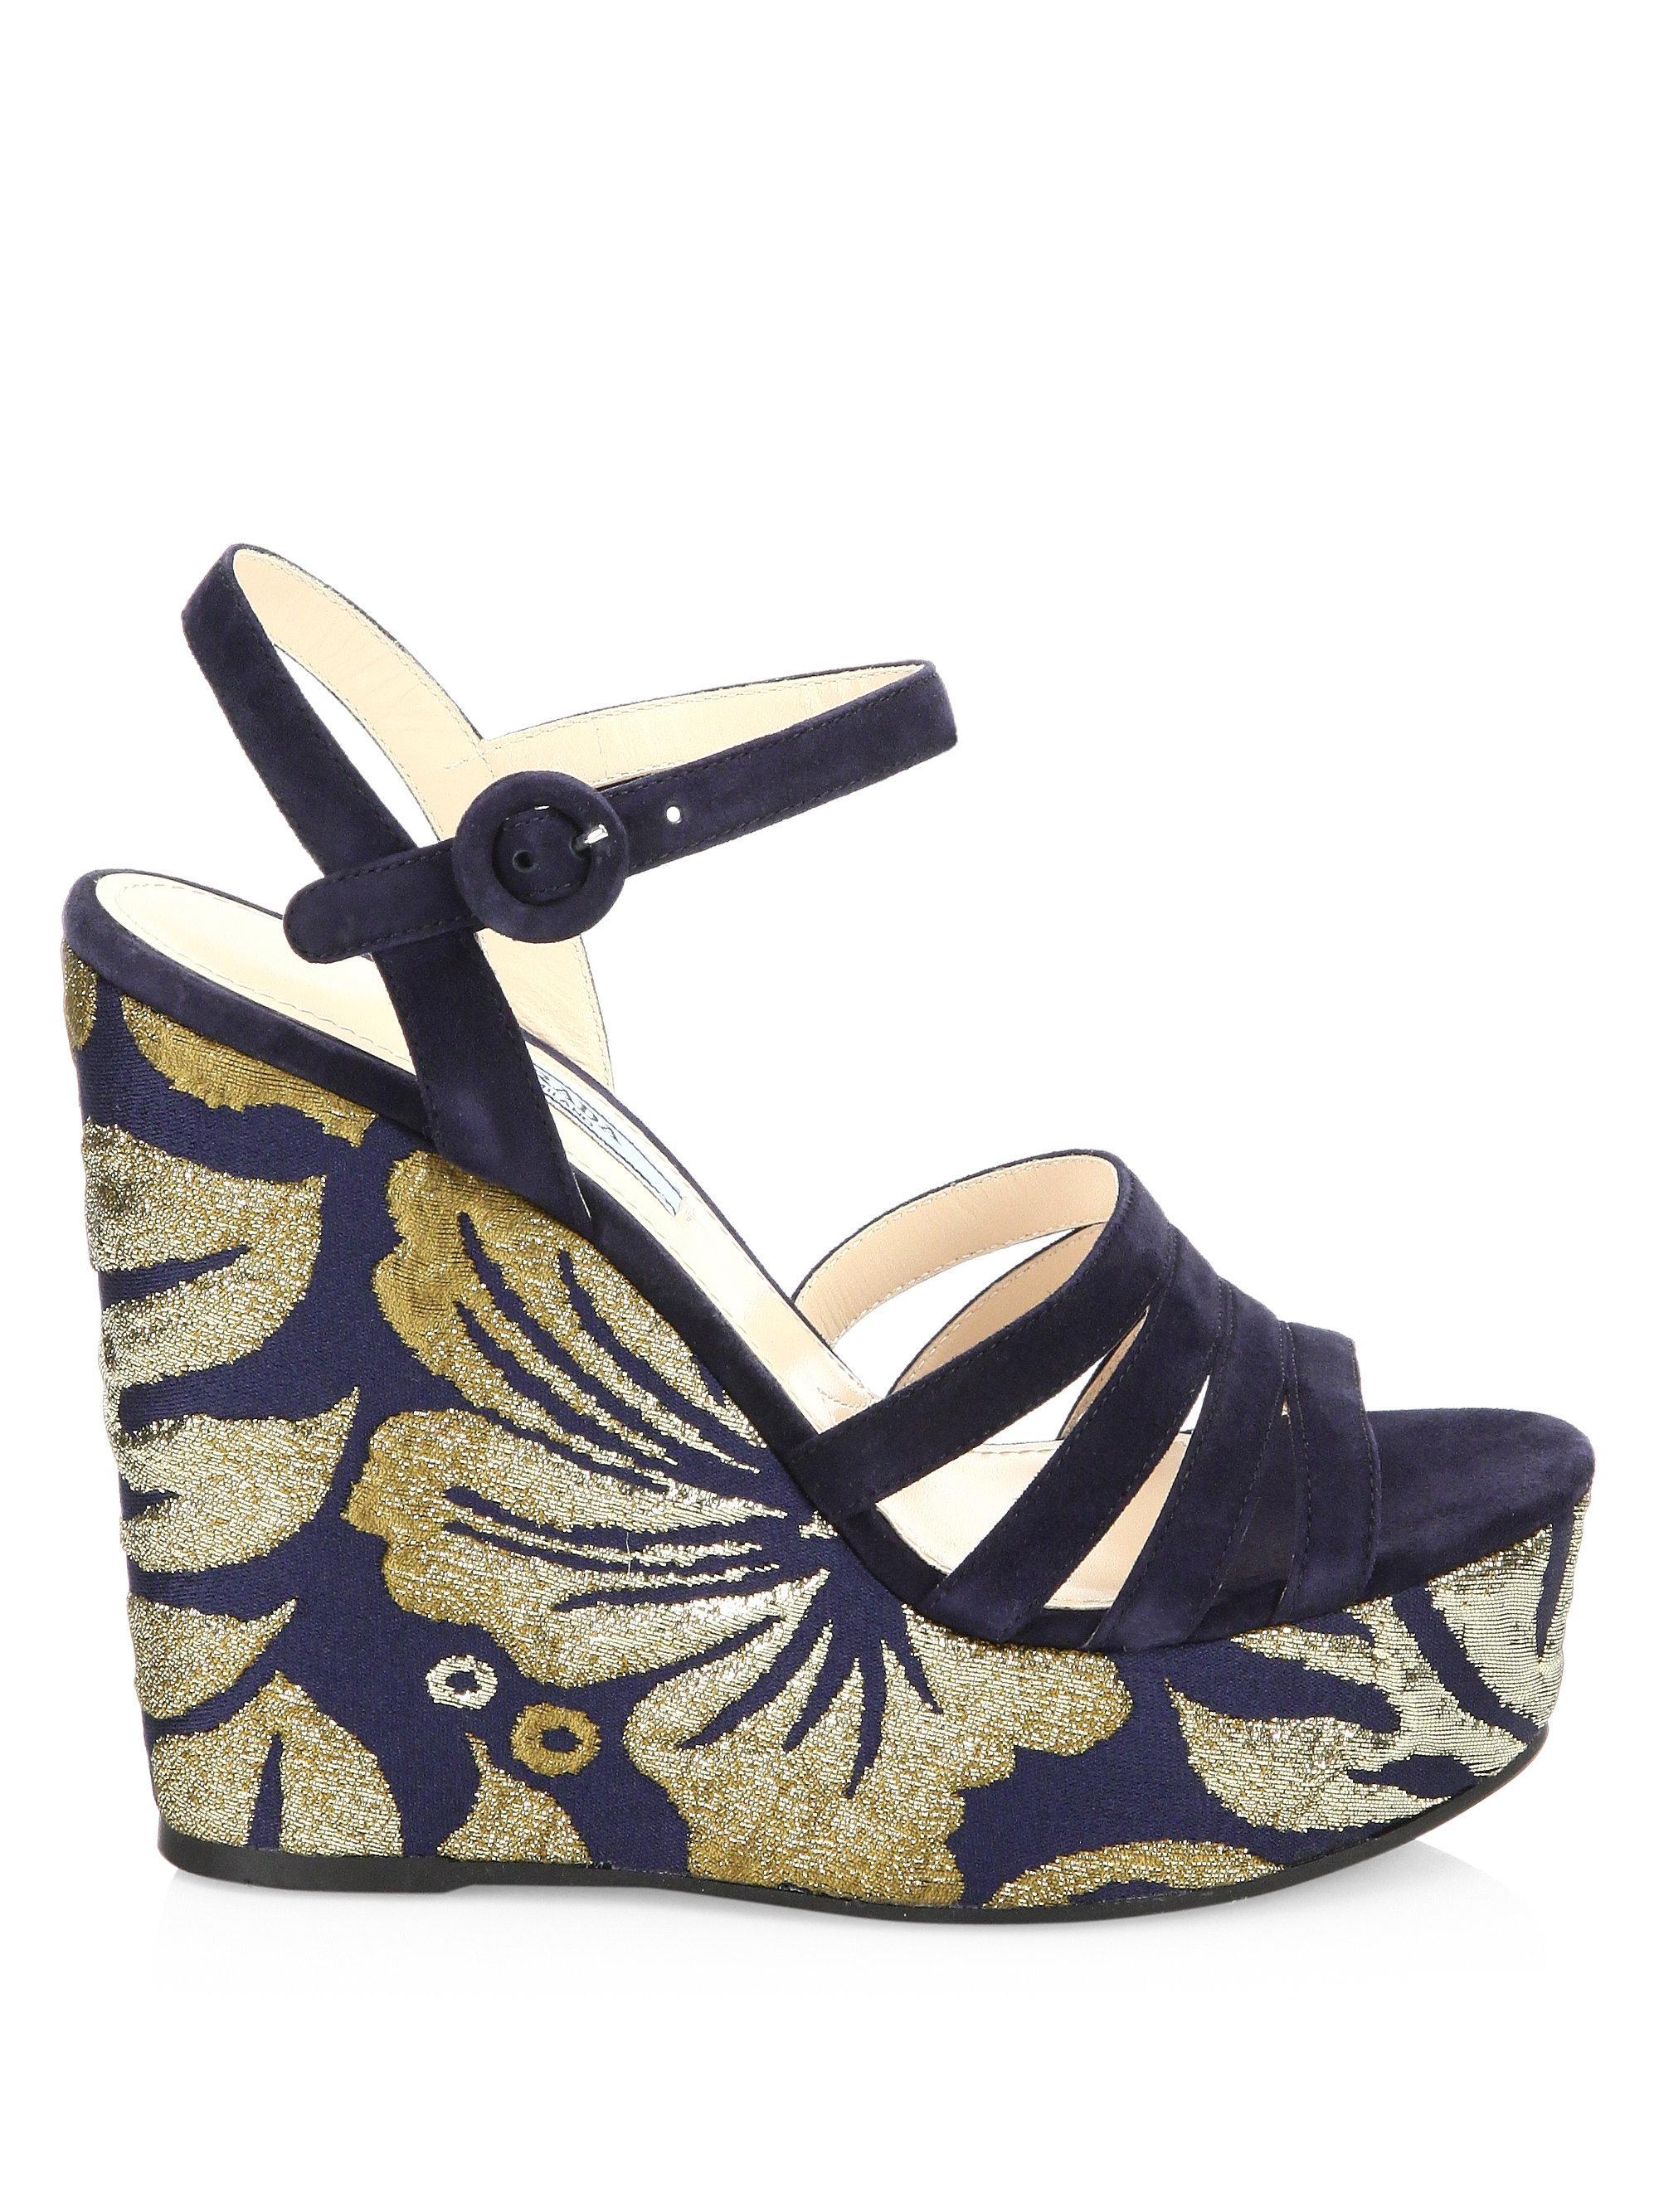 Prada brocade wedge sandals 2014 newest cheap price free shipping for nice dwFe1